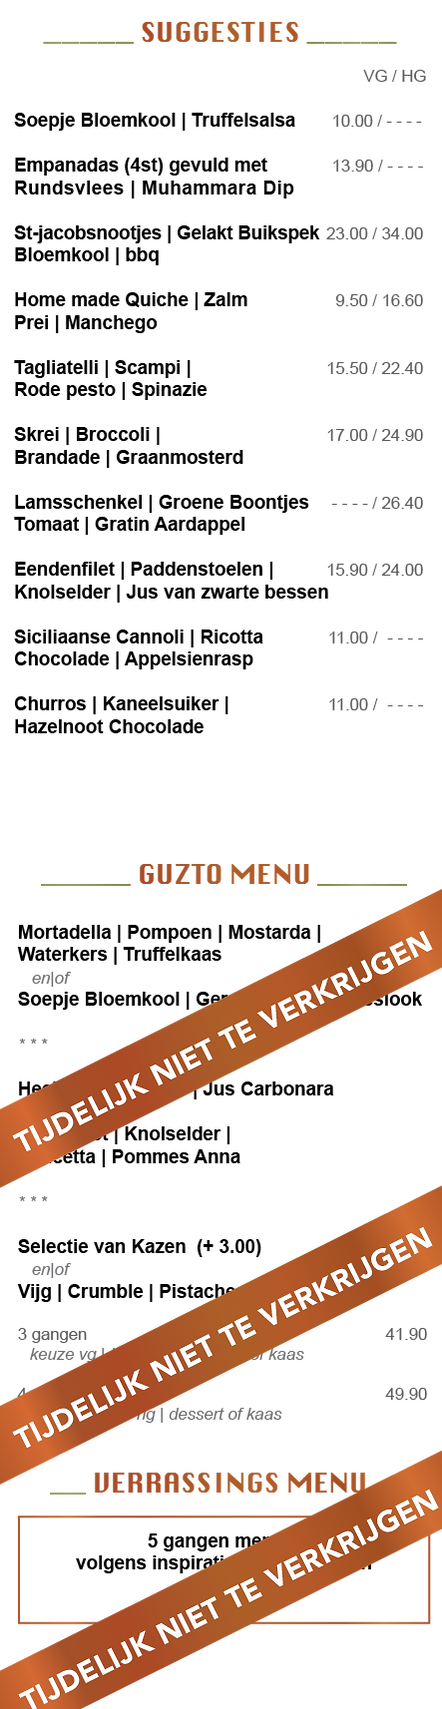 Menukaart_Guzto_202102-FORWEB-7.png